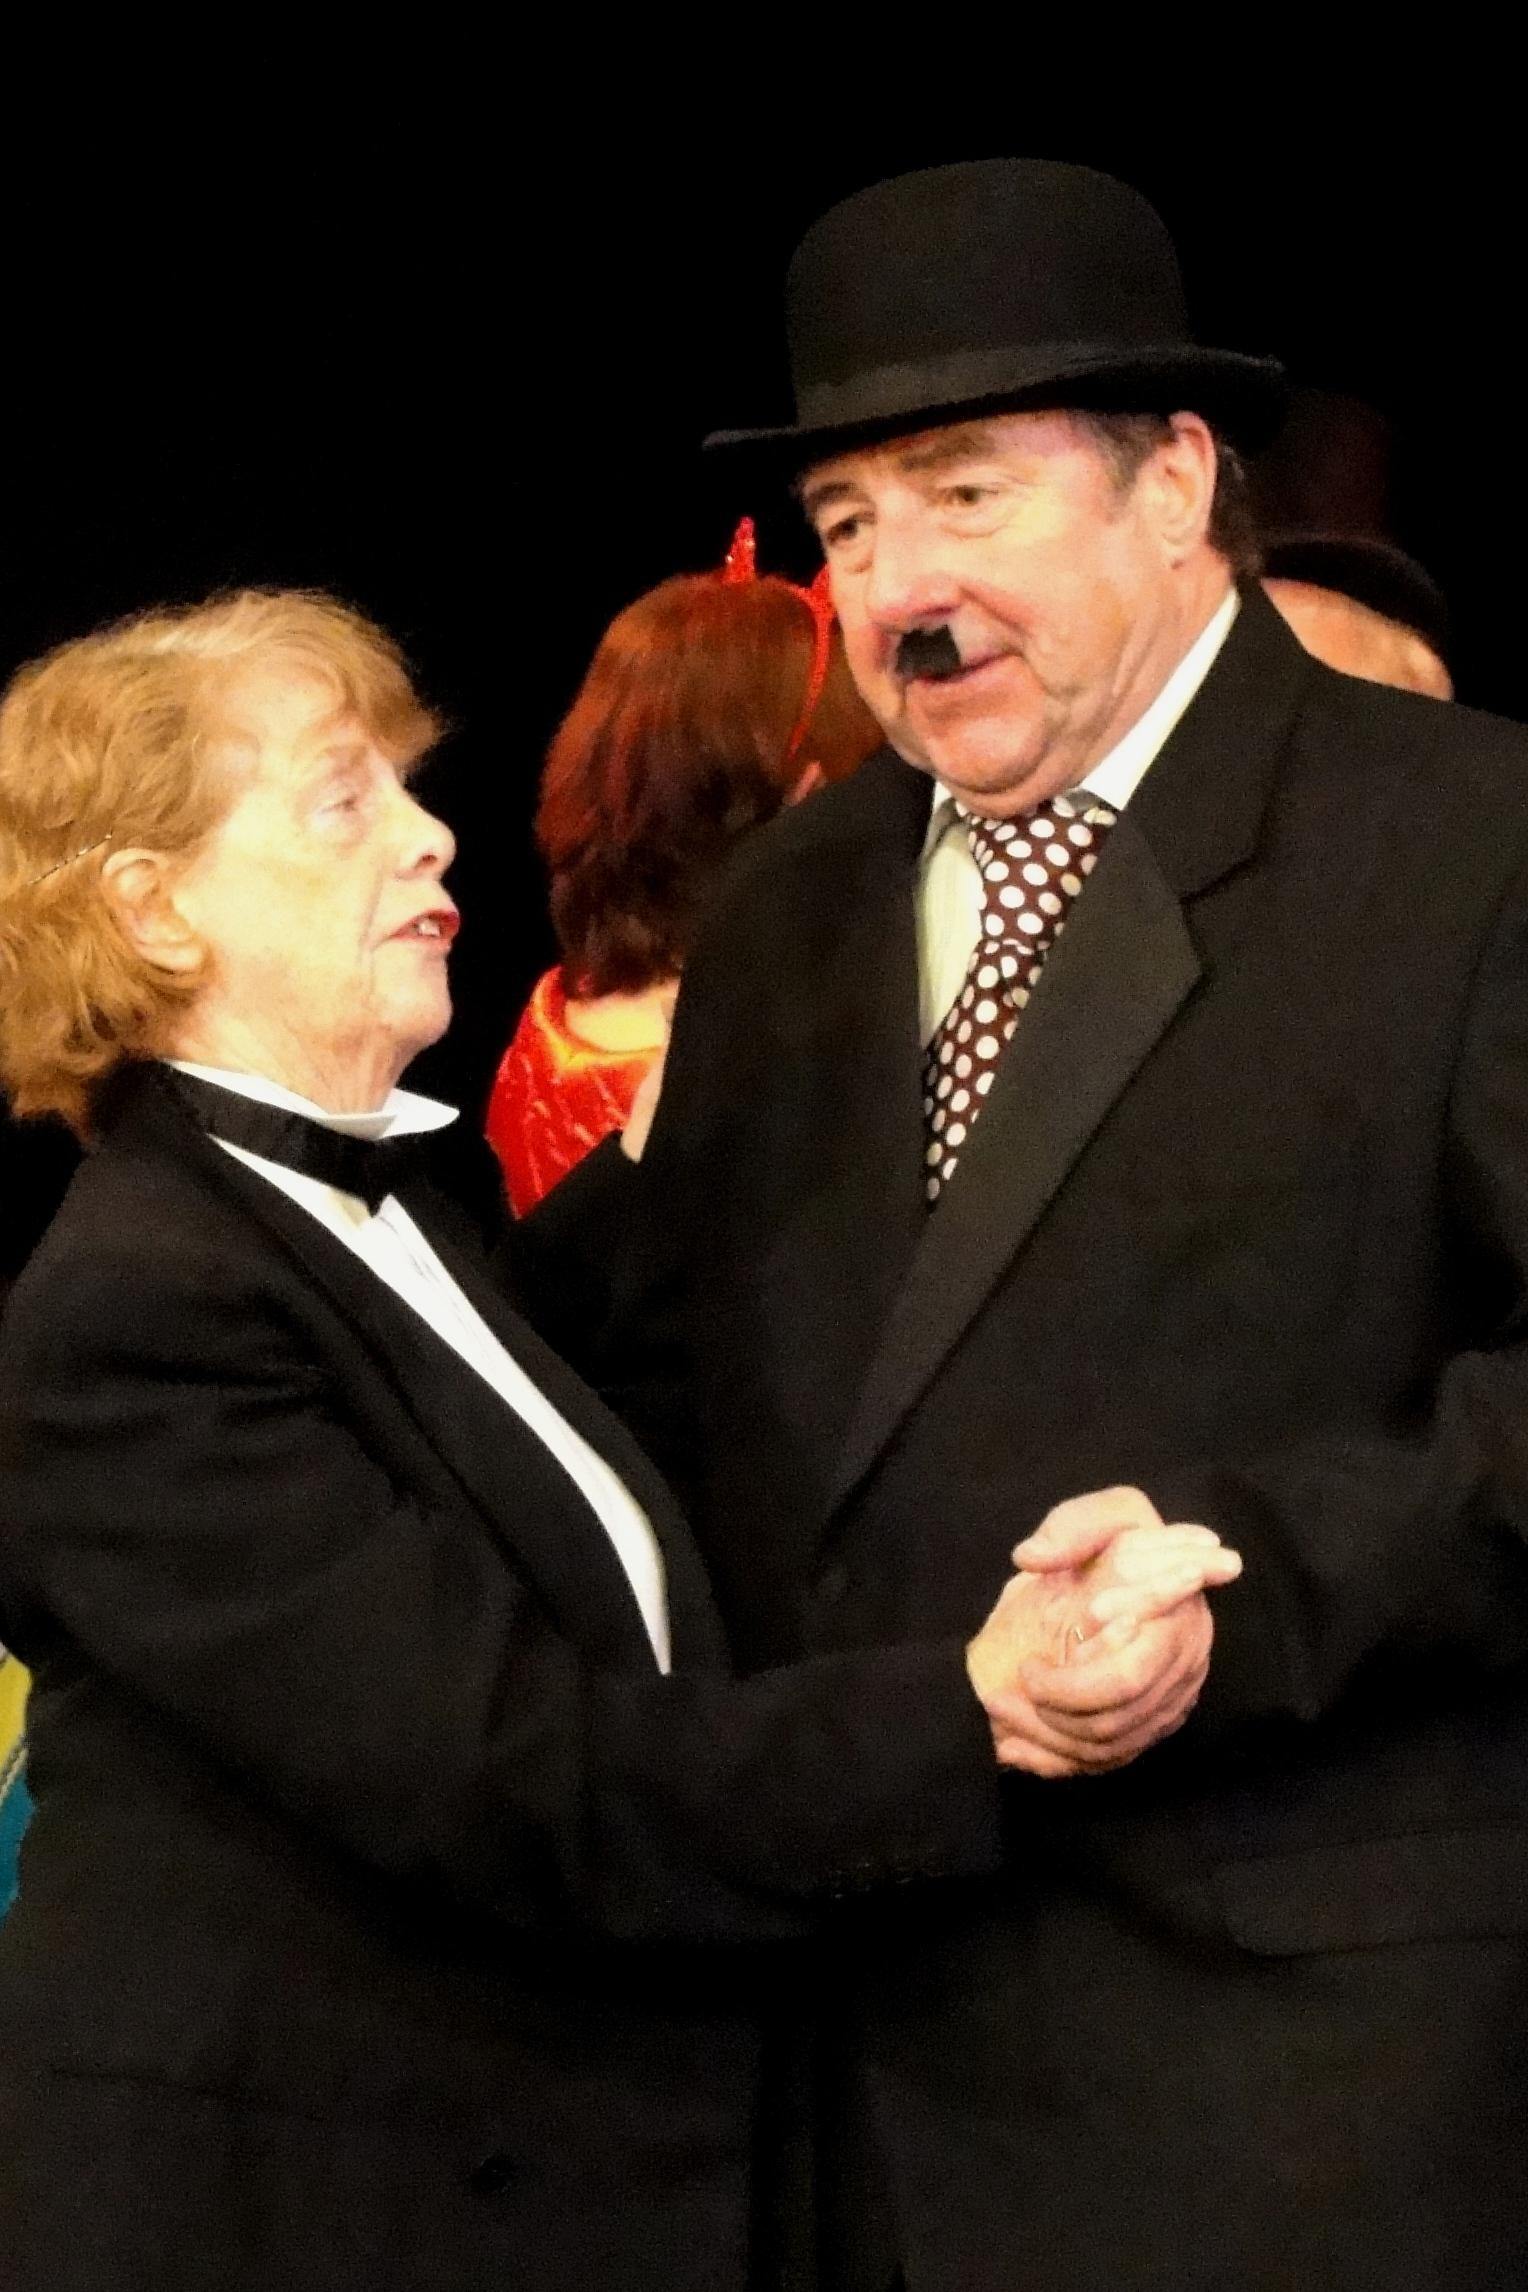 201210 Last Tango in Whitby (22)